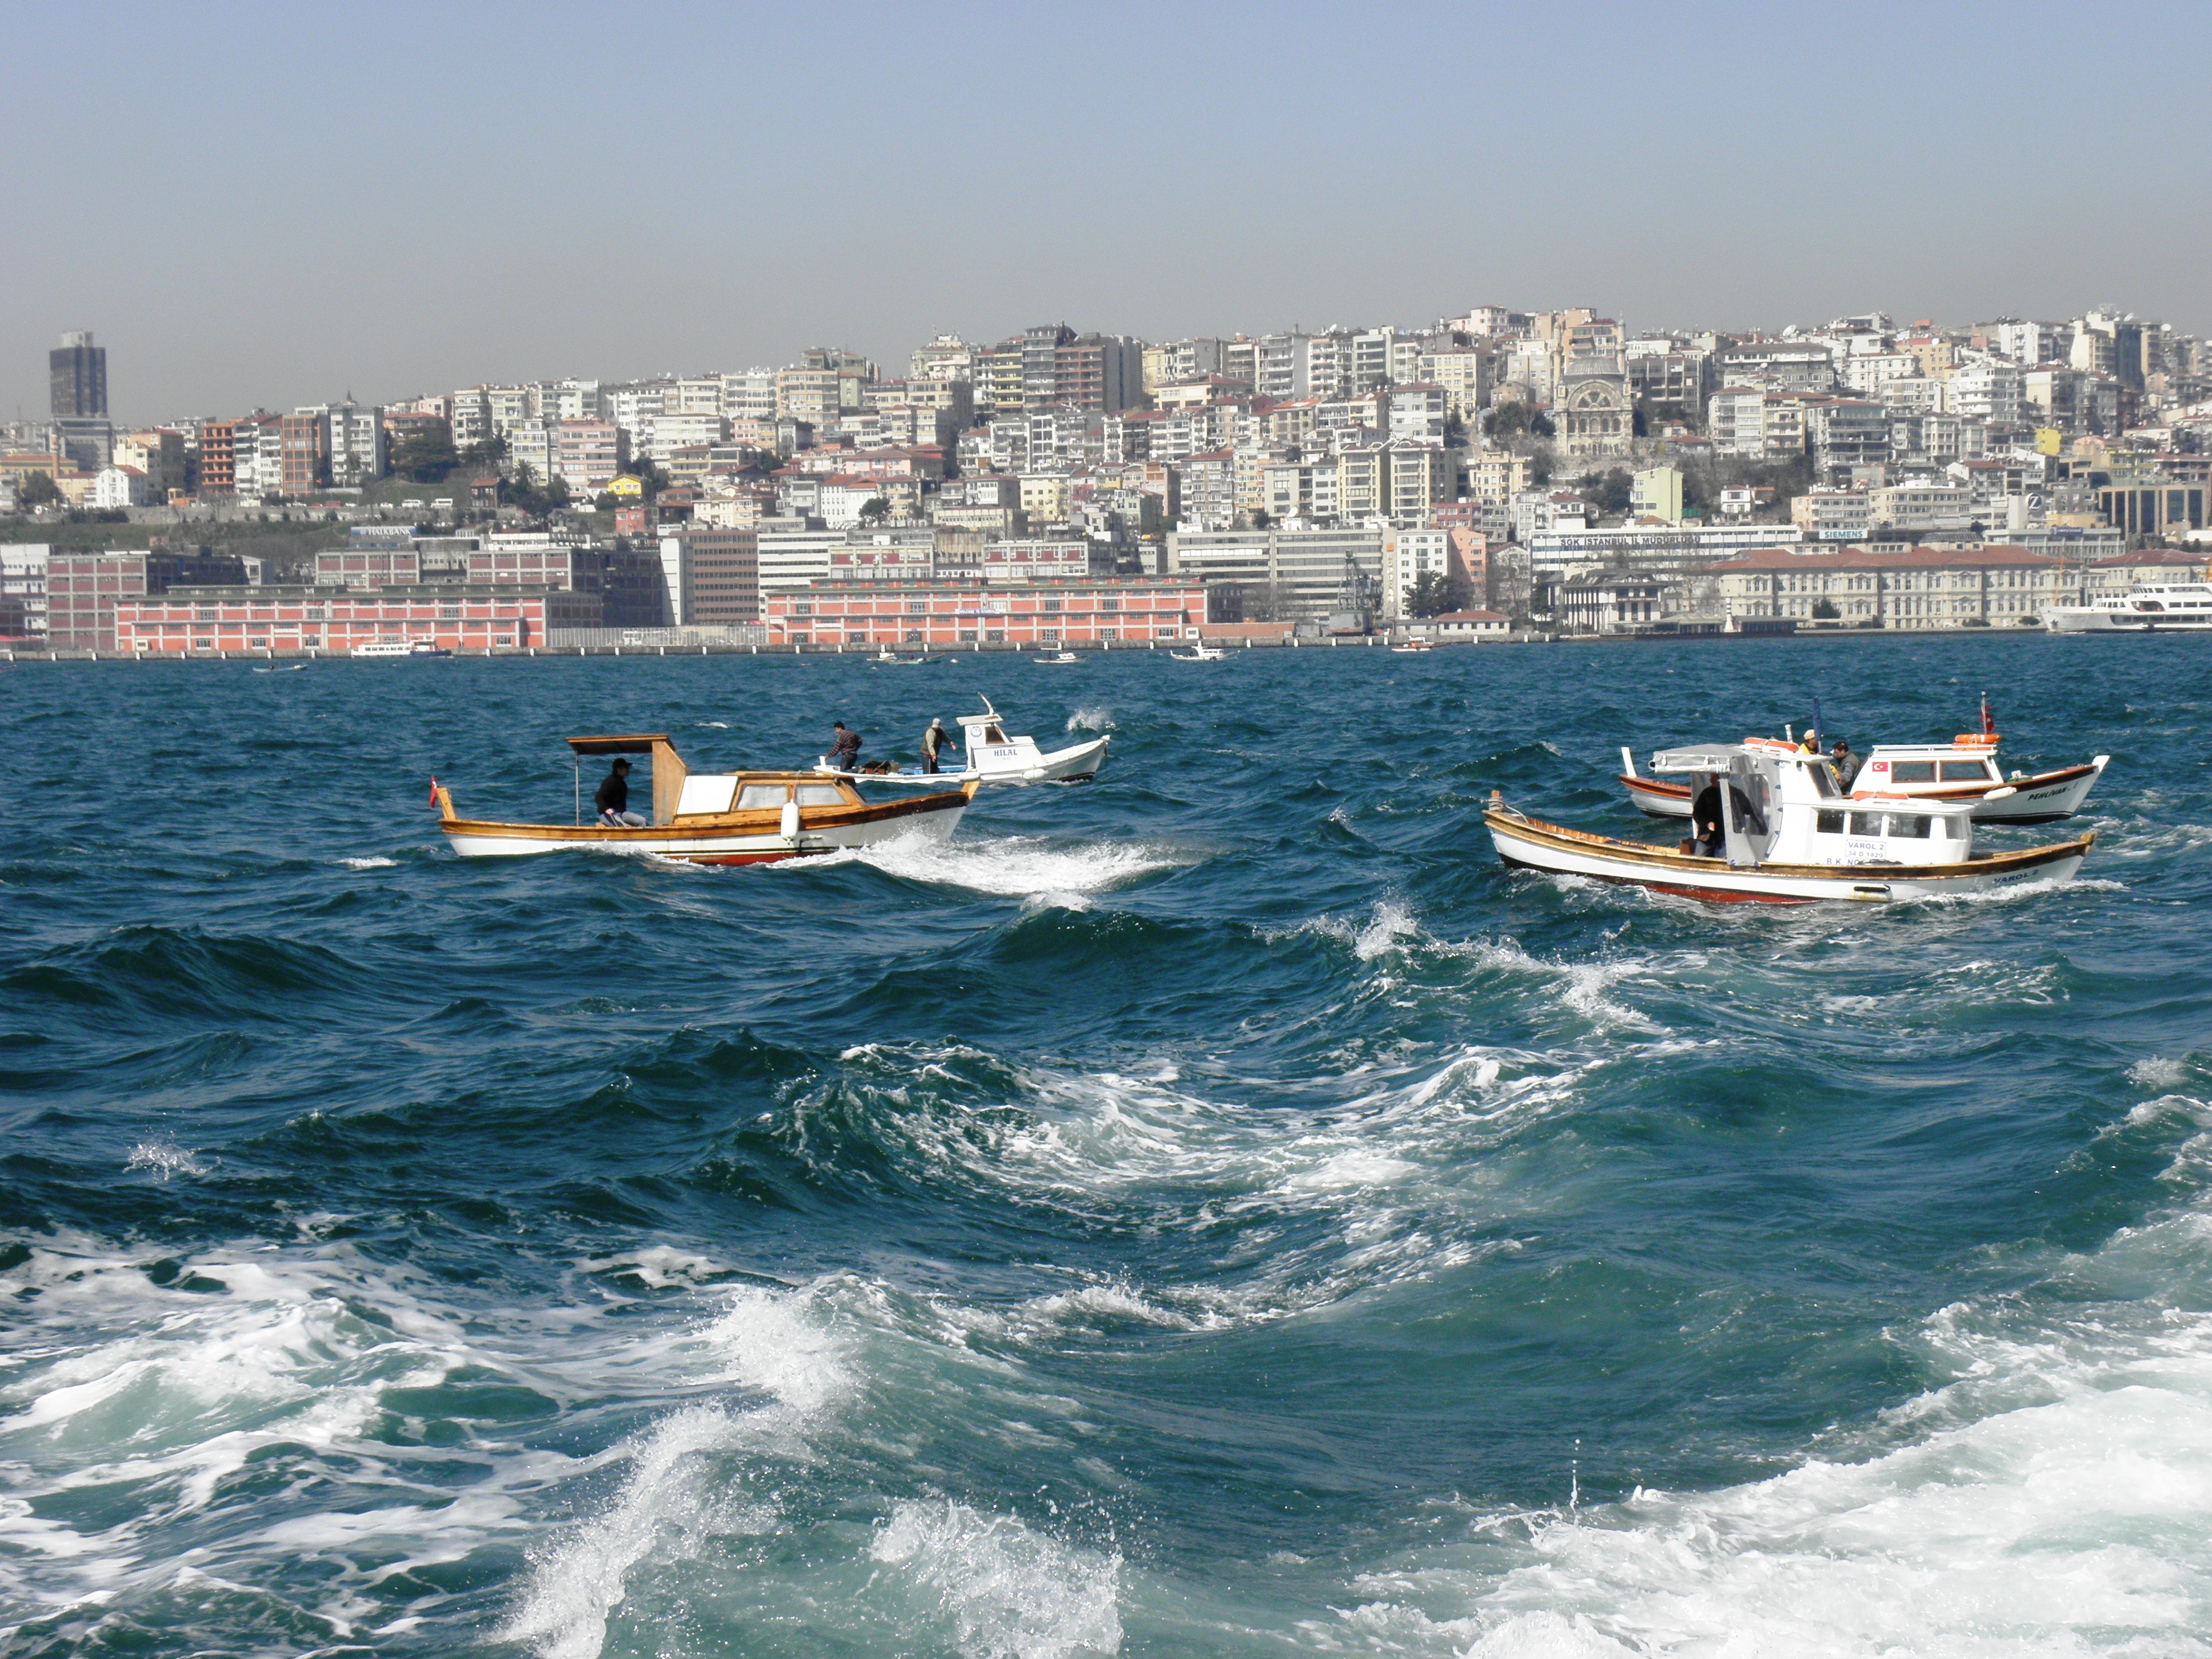 Fishing boats in the bosporus. photo